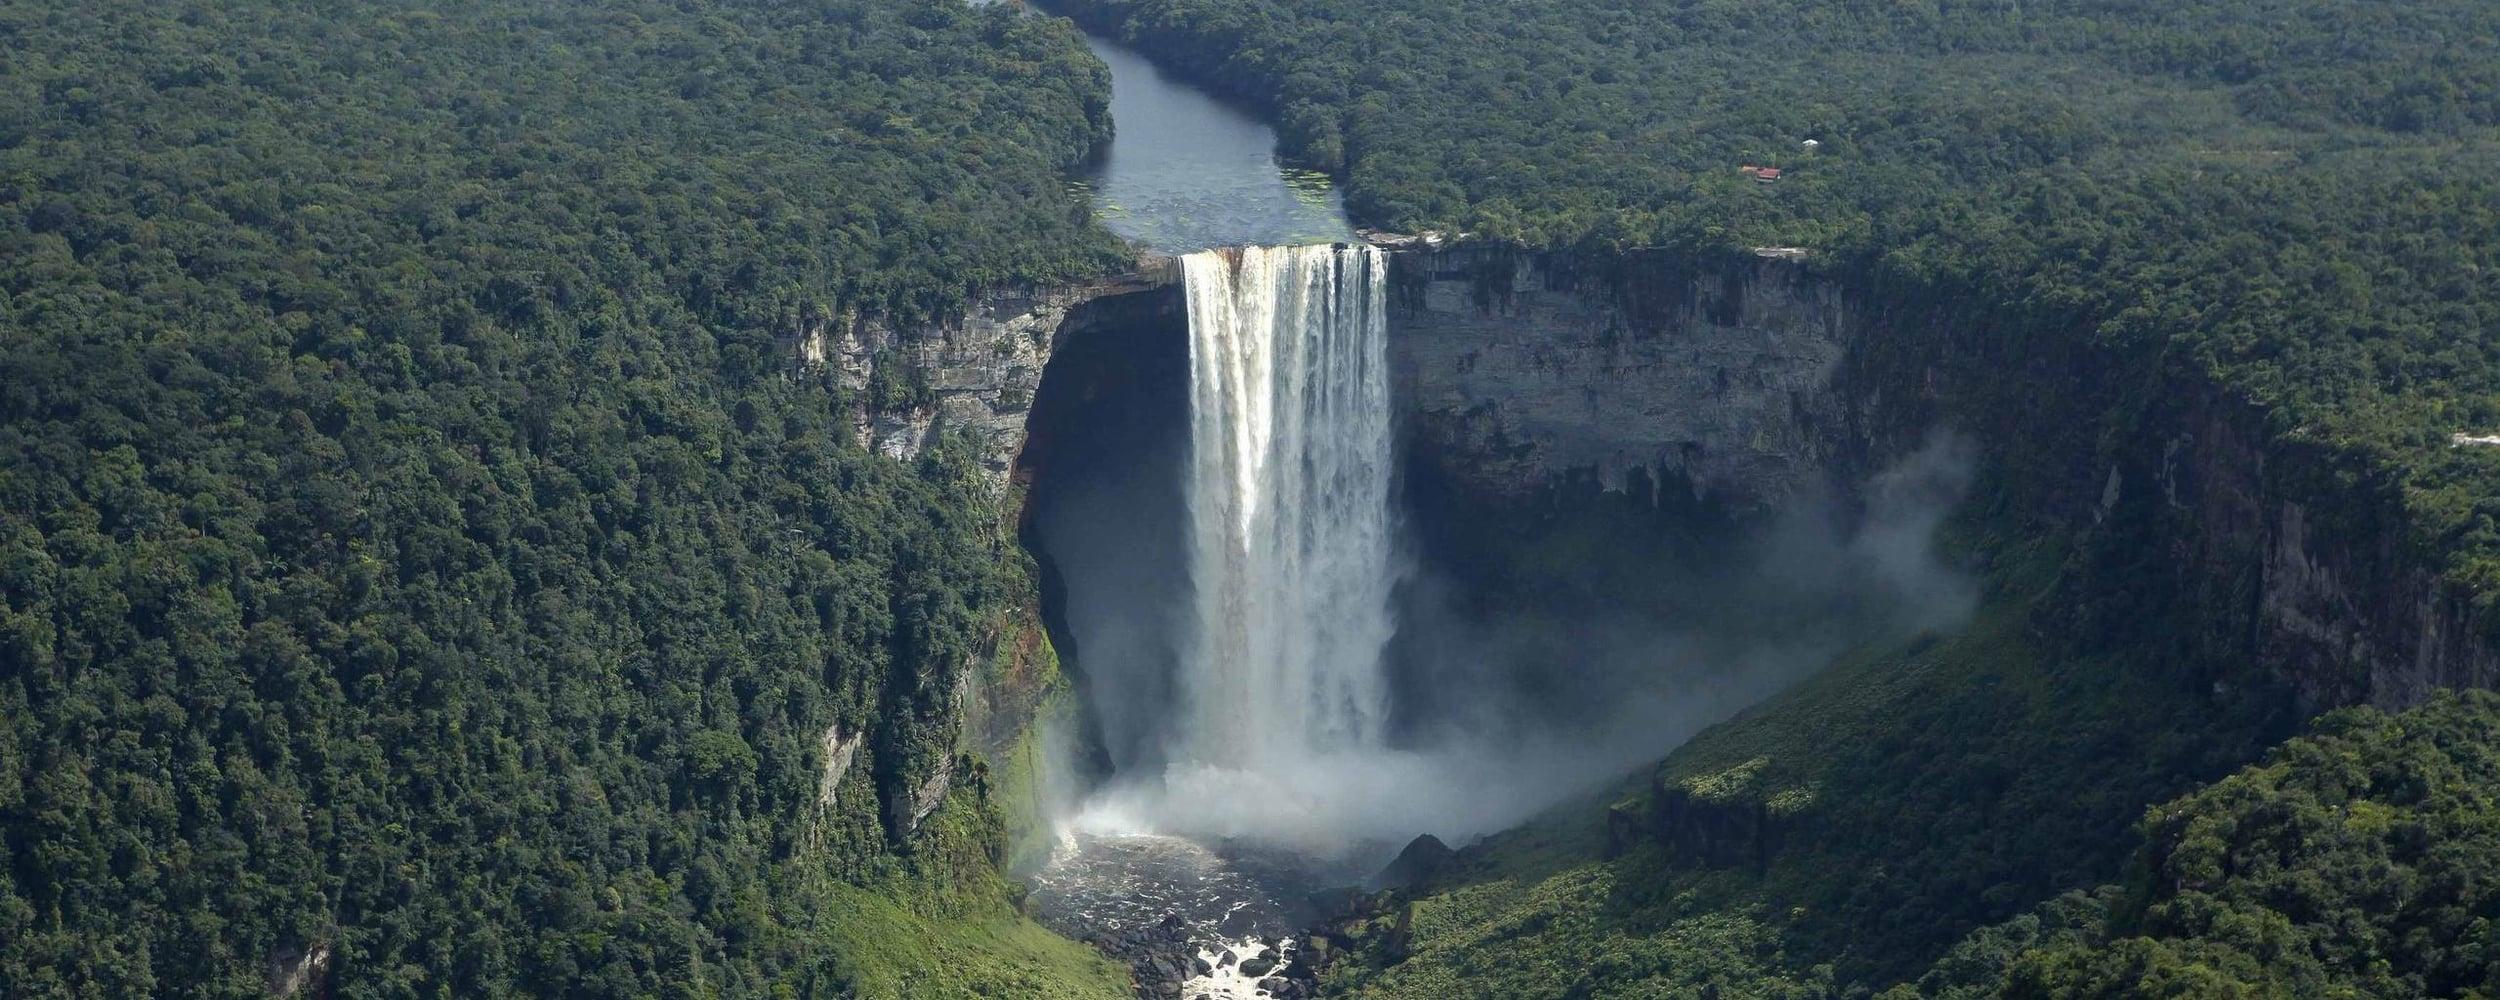 Les chutes du Kaieteur, Guyane